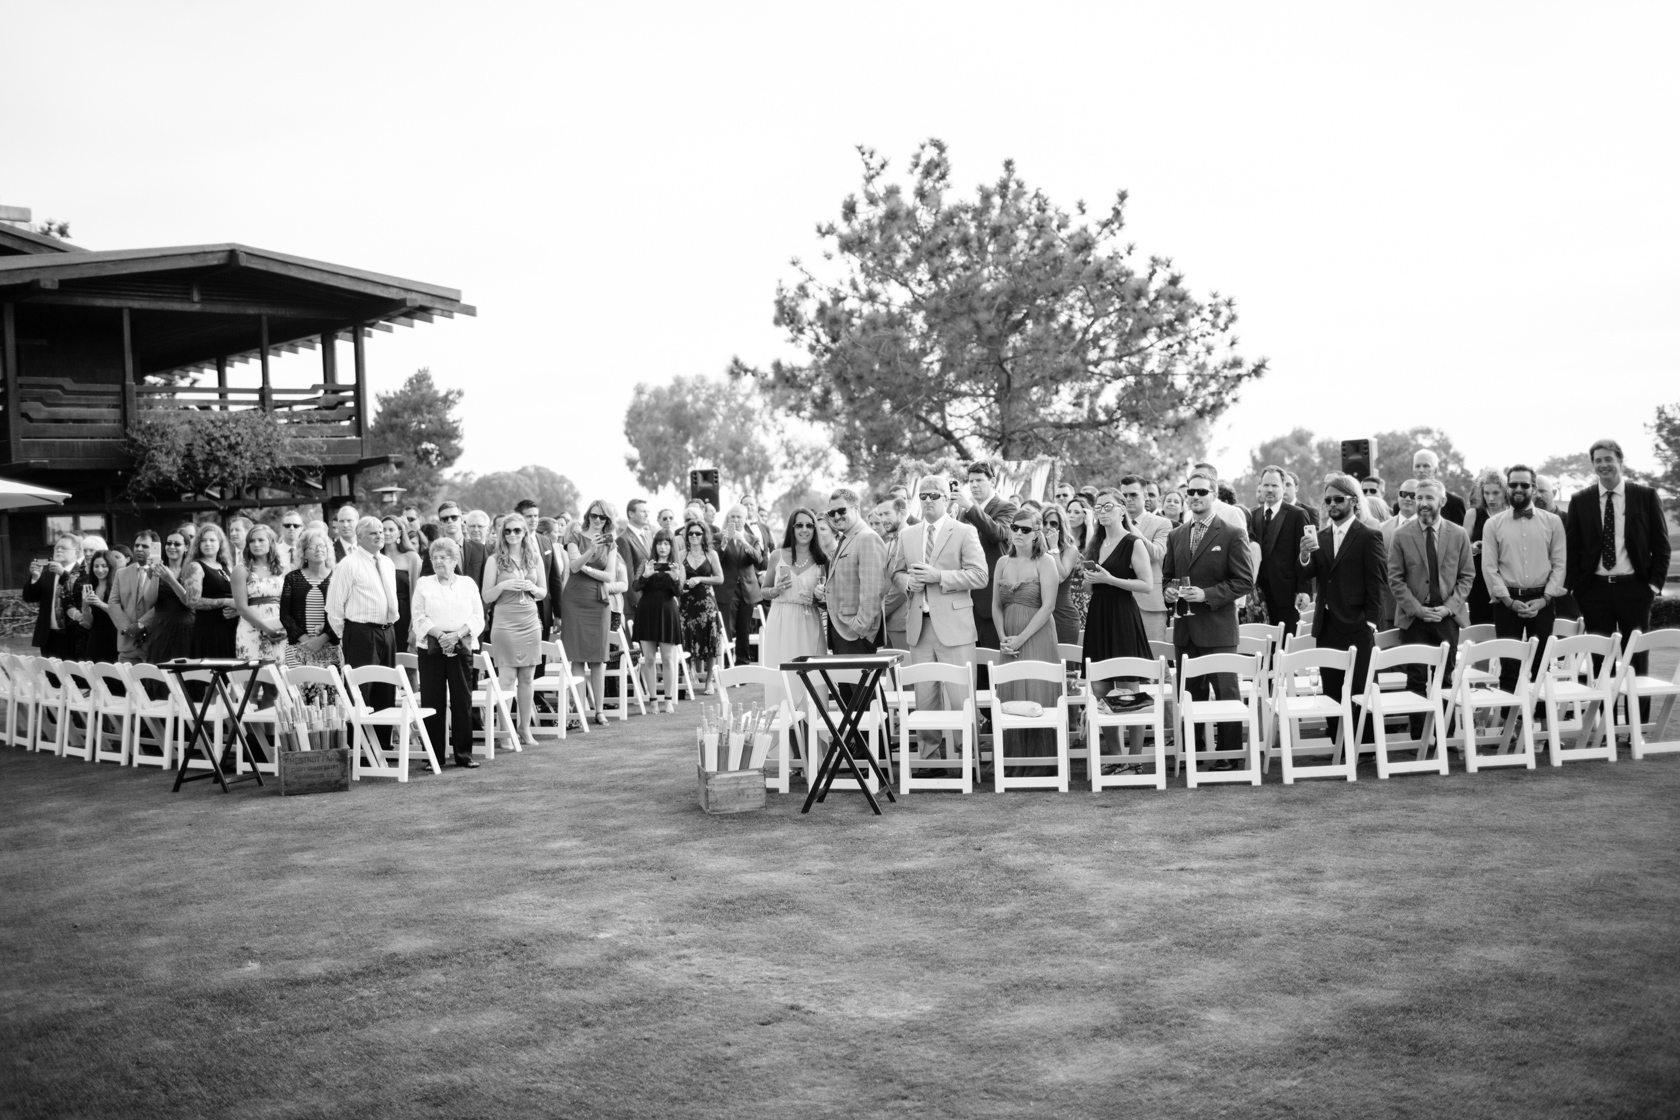 The_Lodge_at_Torrey_Pines_Wedding_040.jpg